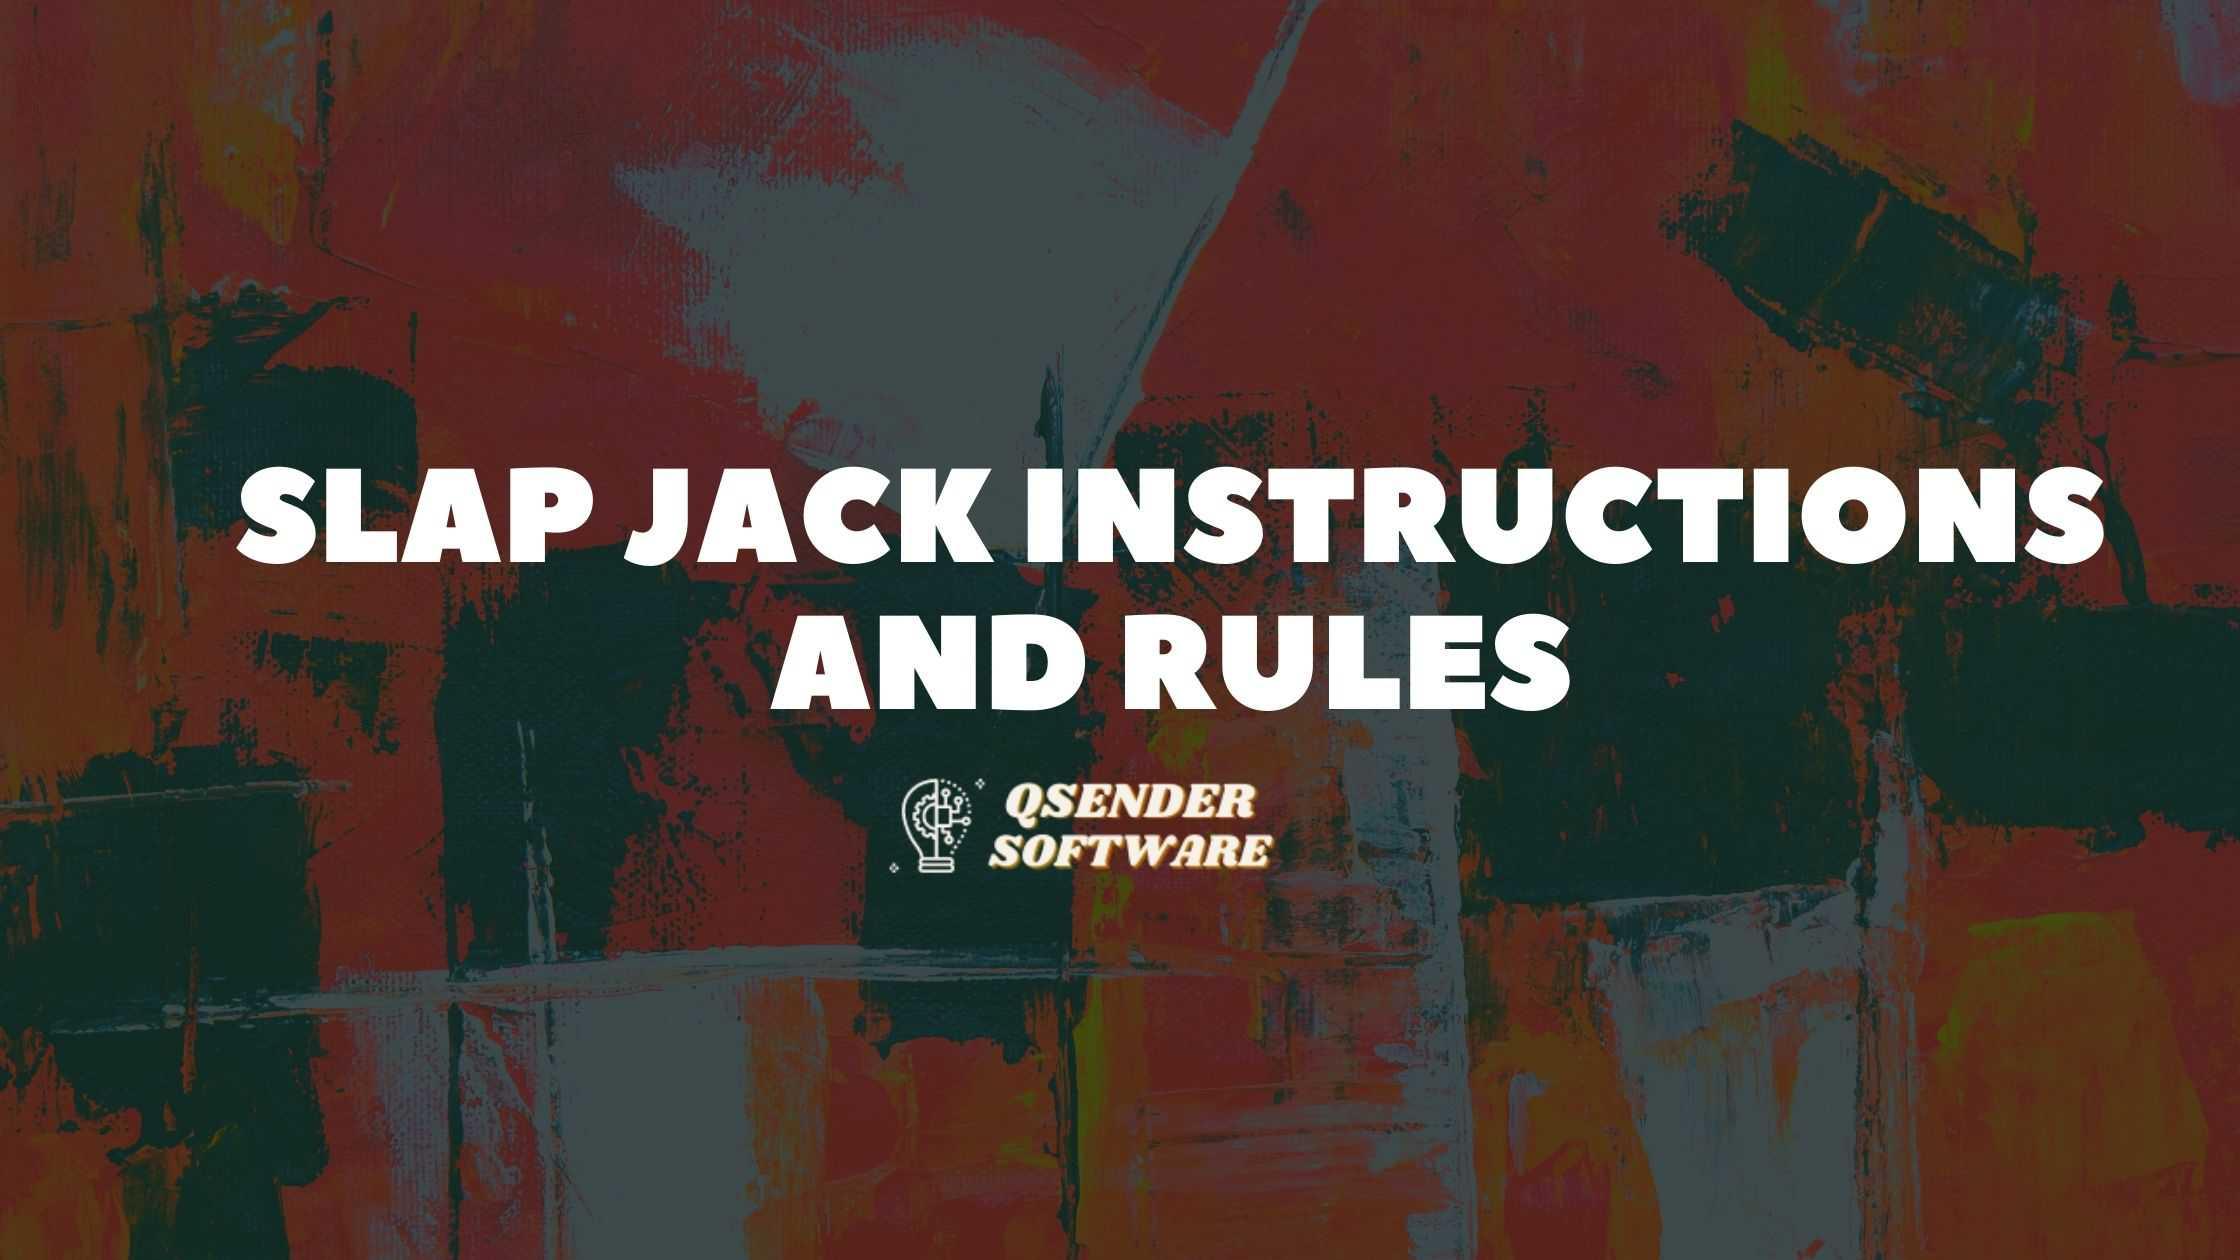 Slap Jack Instructions